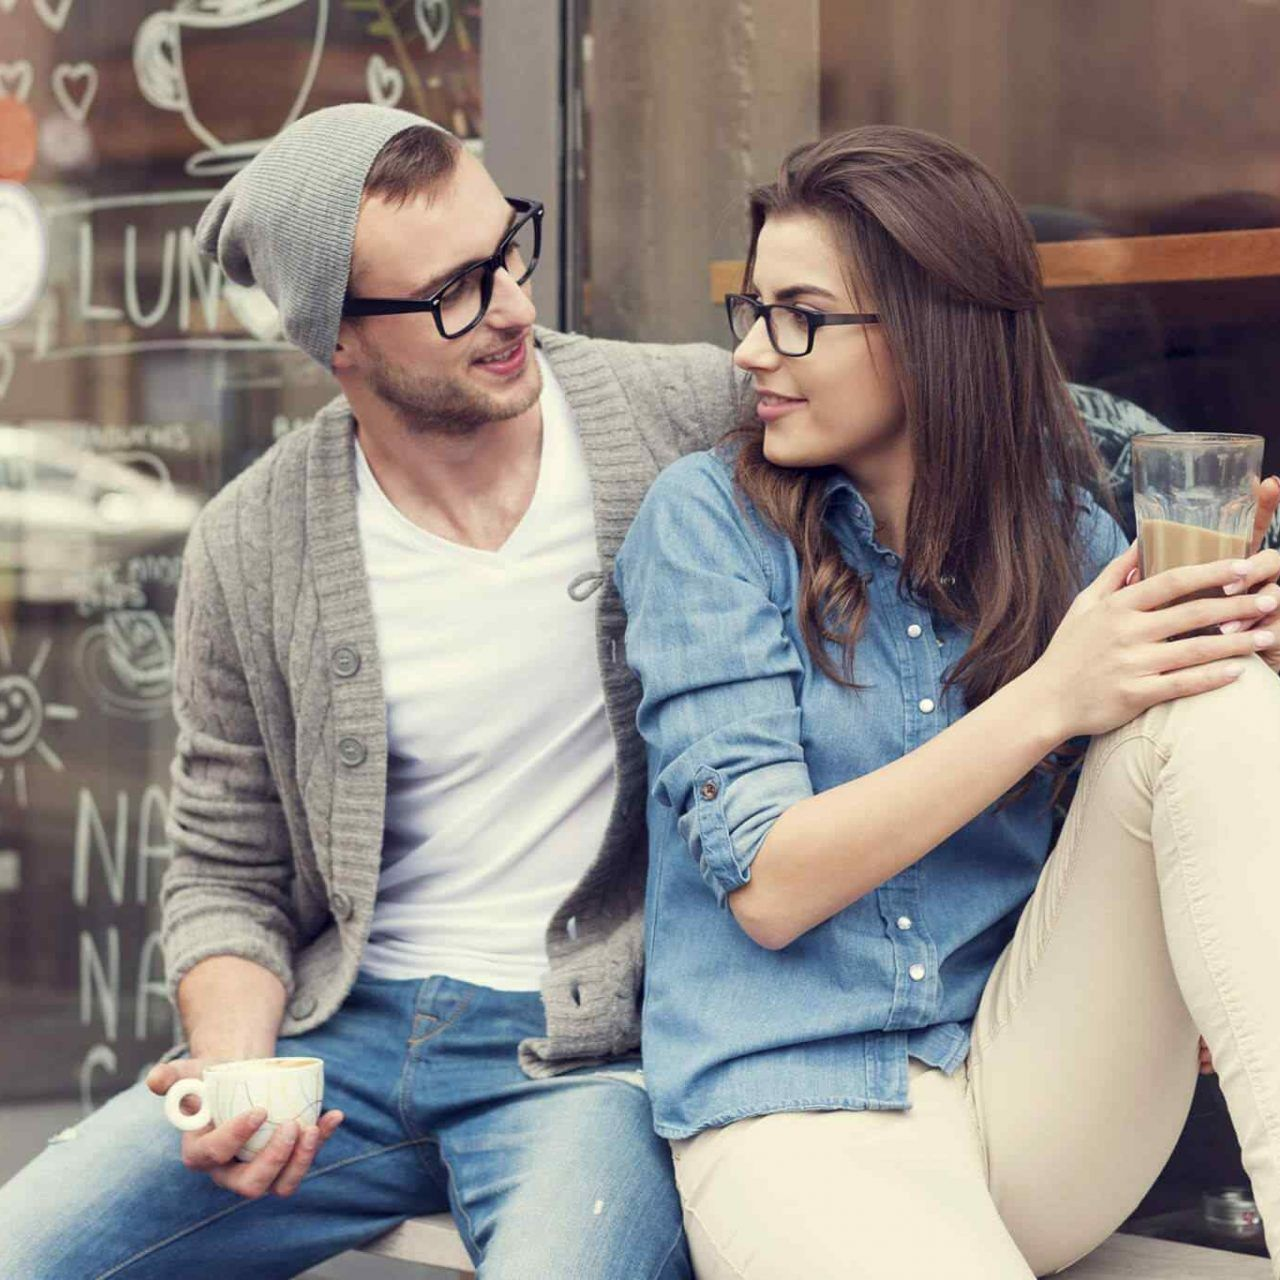 https://growthadvisors.pl/wp-content/uploads/2018/01/img-class-marriage-02-1280x1280.jpg